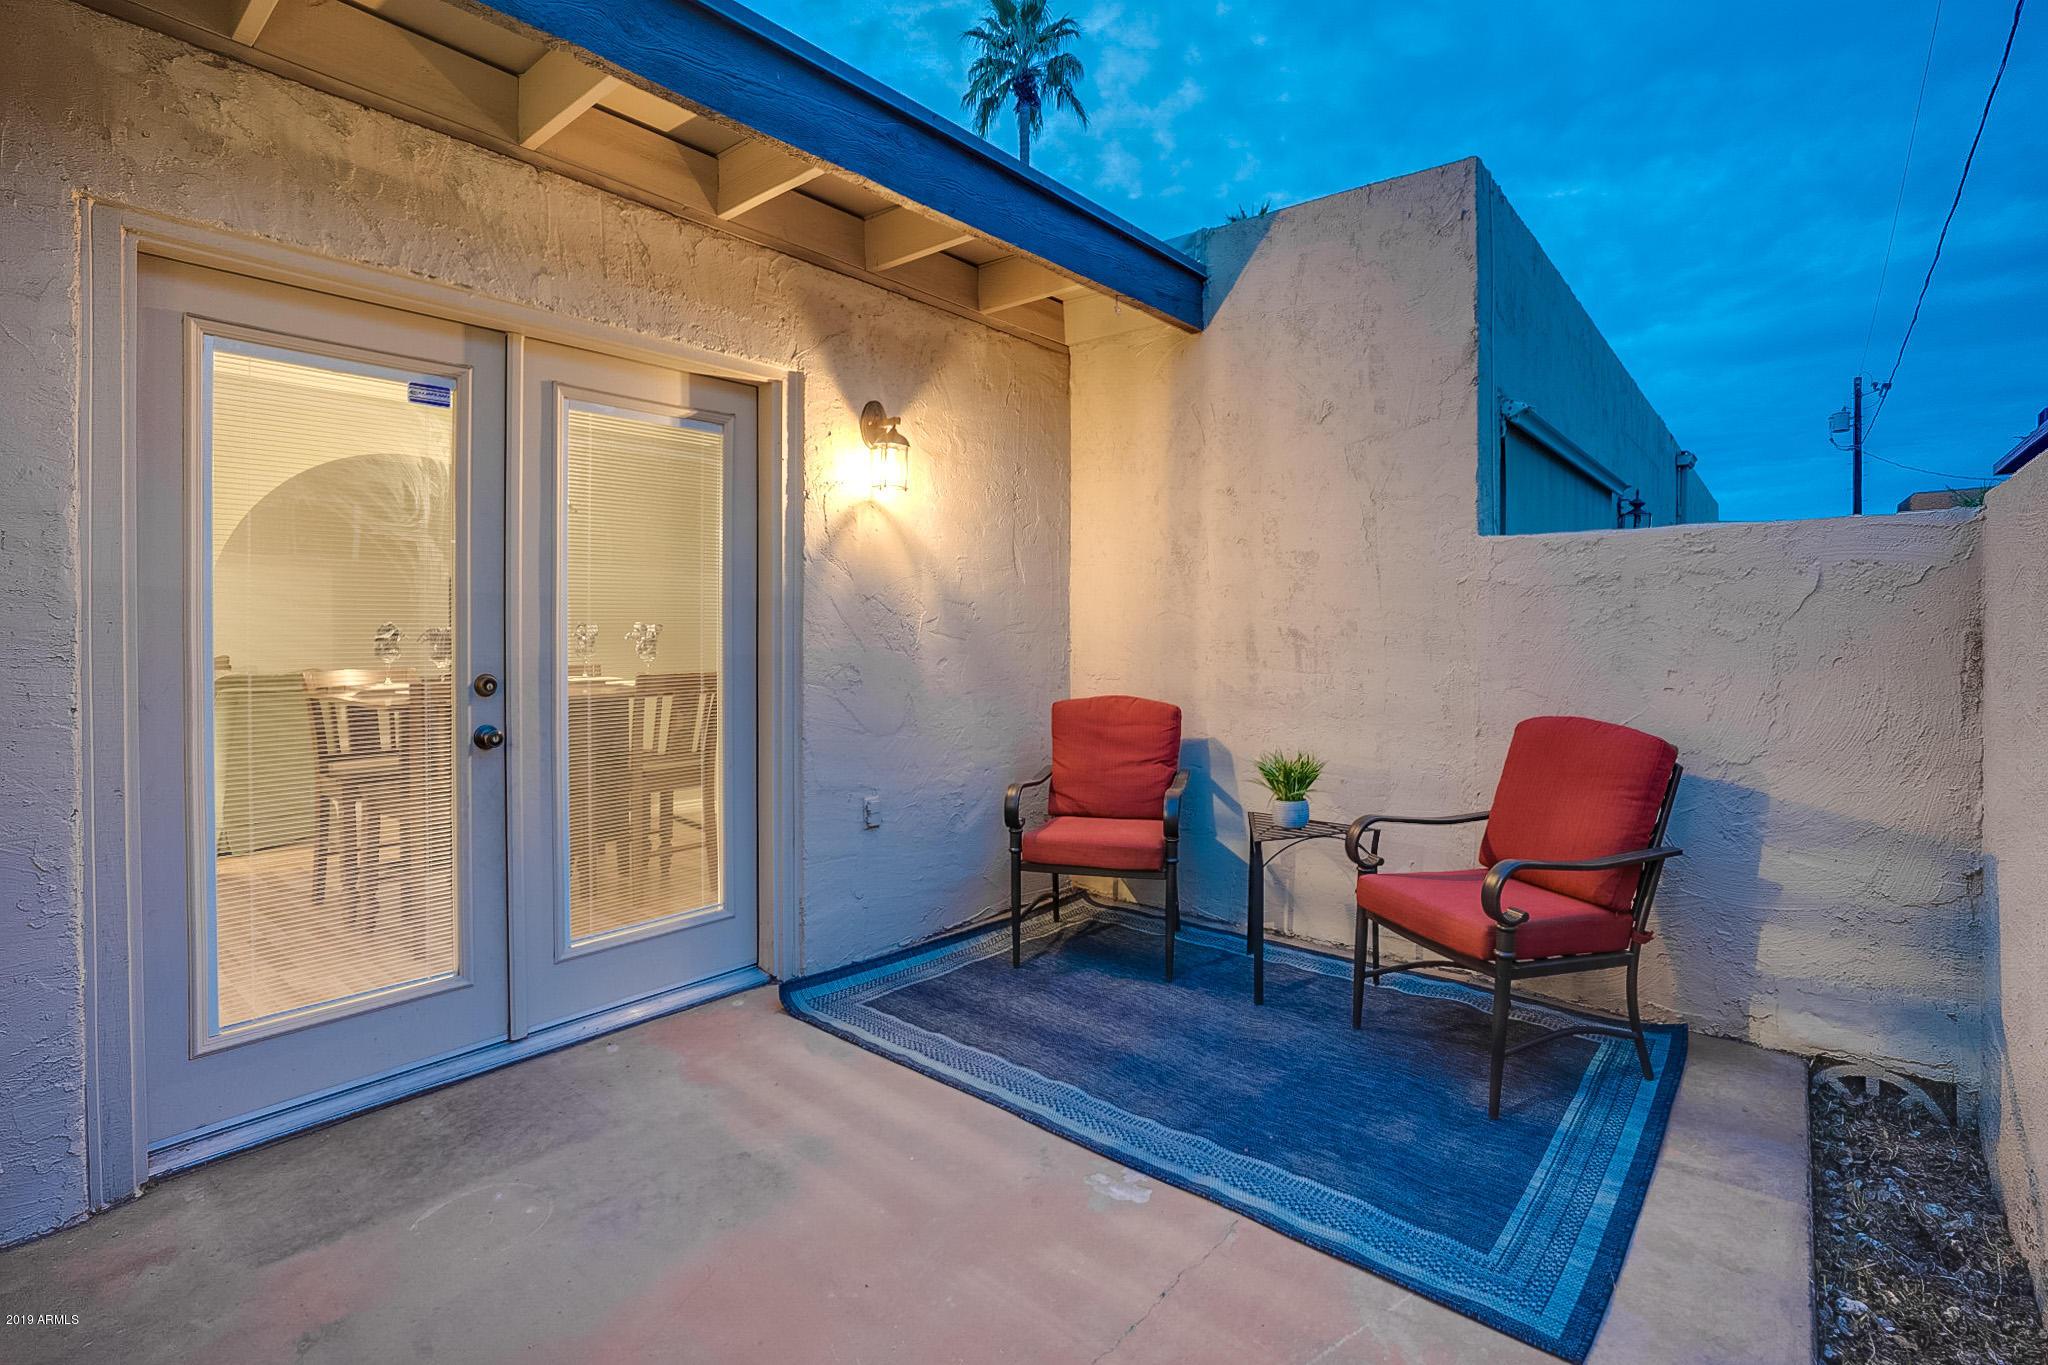 Photo of 6501 N VILLA MANANA Drive, Phoenix, AZ 85014